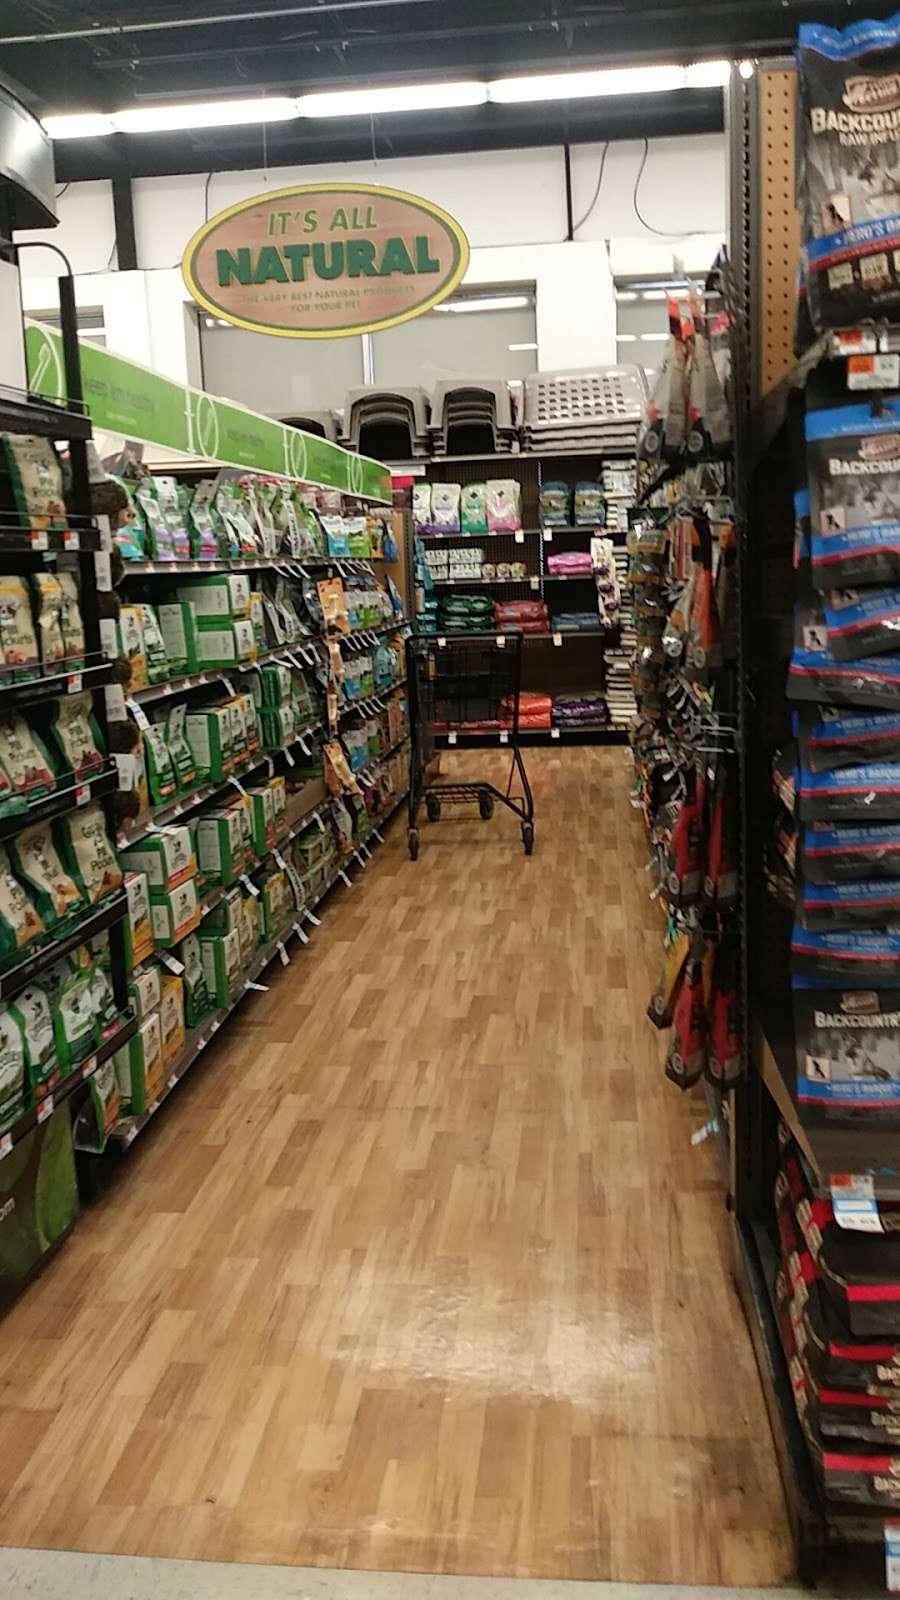 Petco Animal Supplies - store    Photo 5 of 10   Address: 780 Rte 3 West, Clifton, NJ 07012, USA   Phone: (973) 472-3344